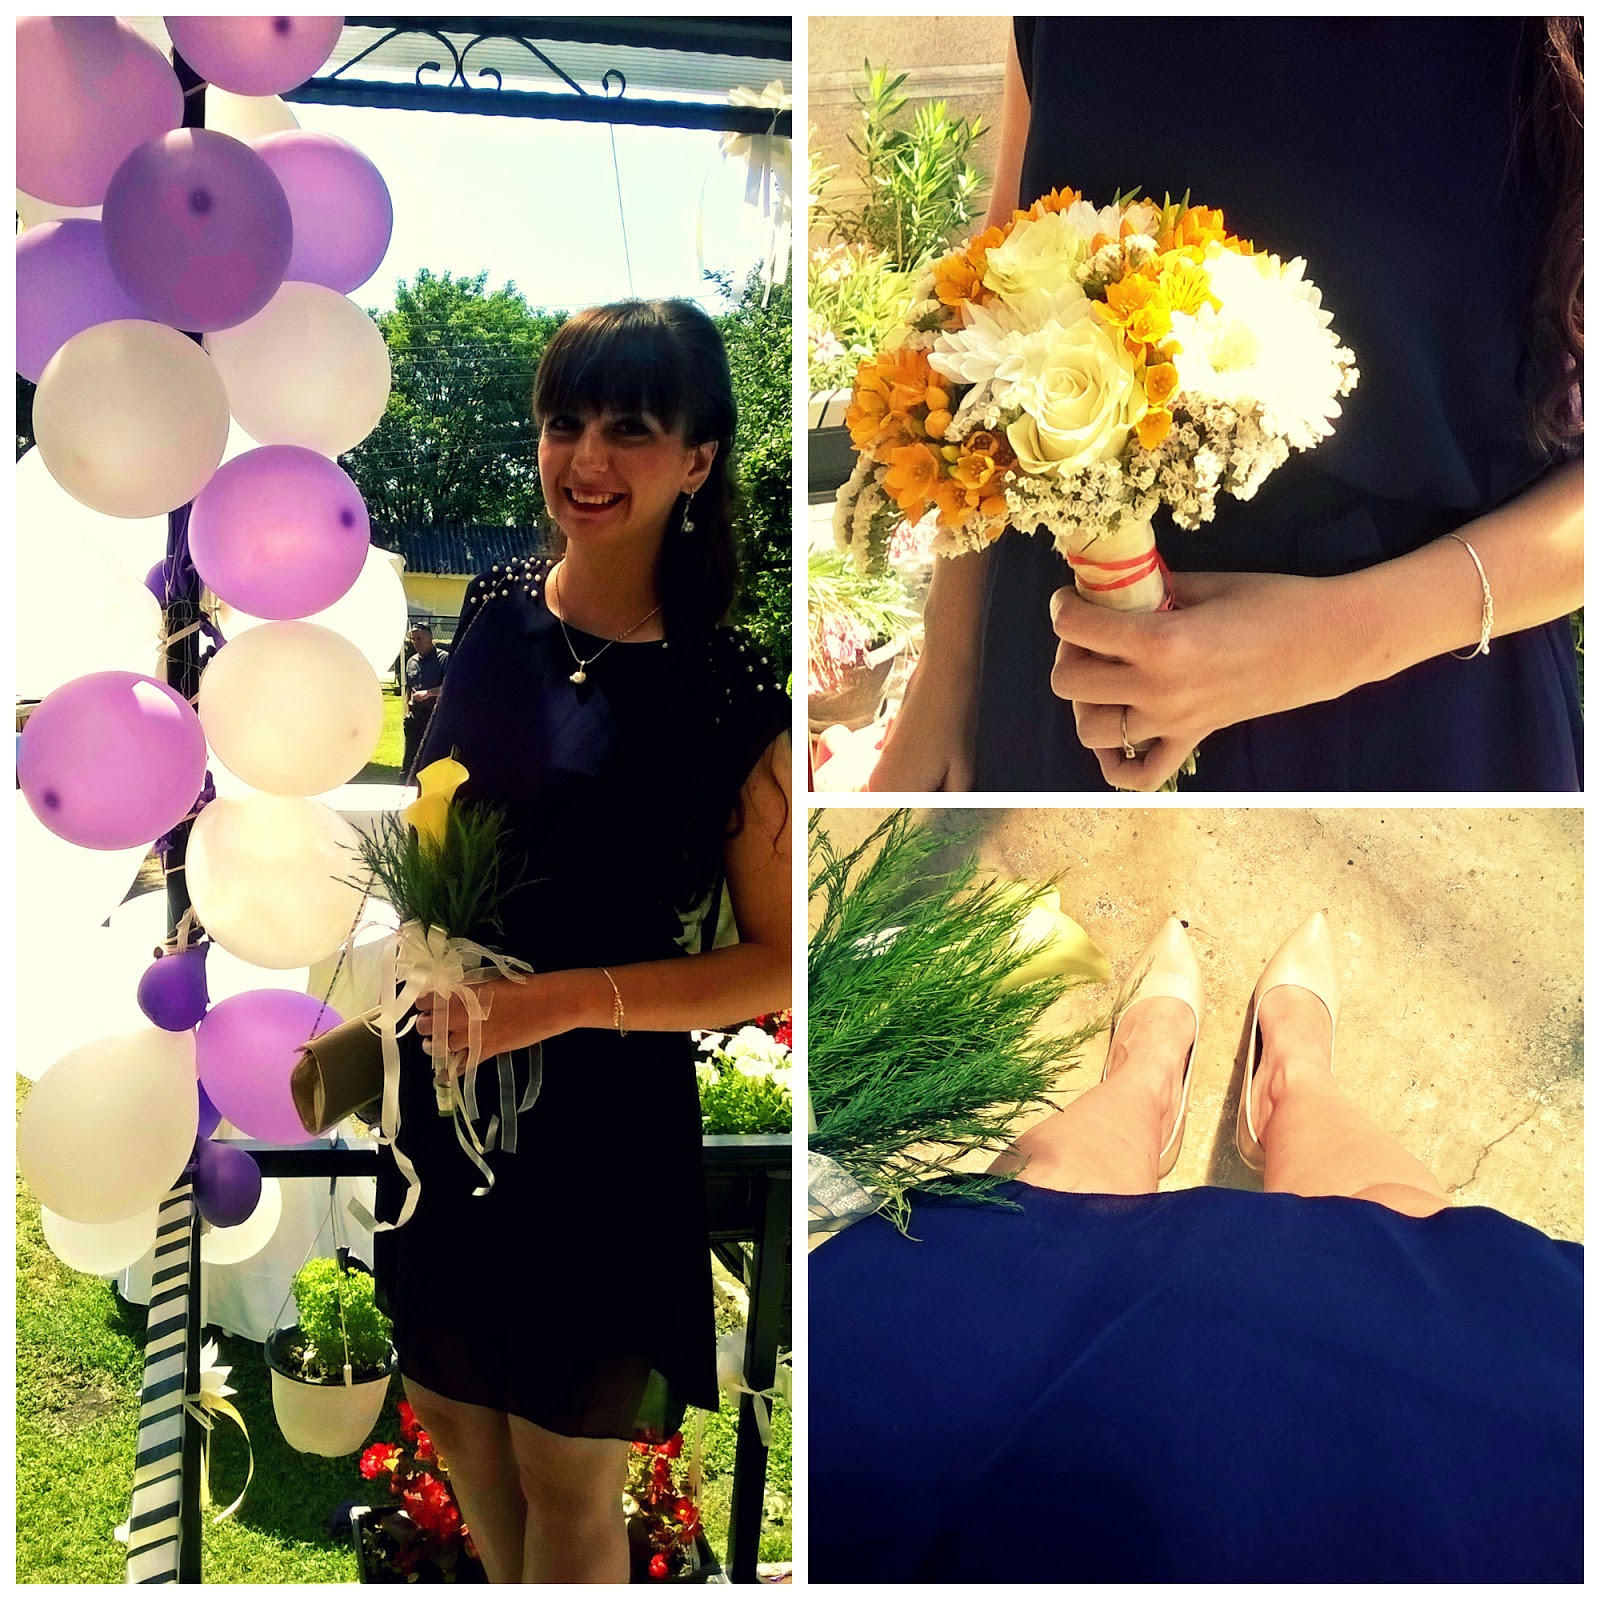 http://sanjaburgundy.blogspot.com/2014/07/wedding-bridesmaid.html